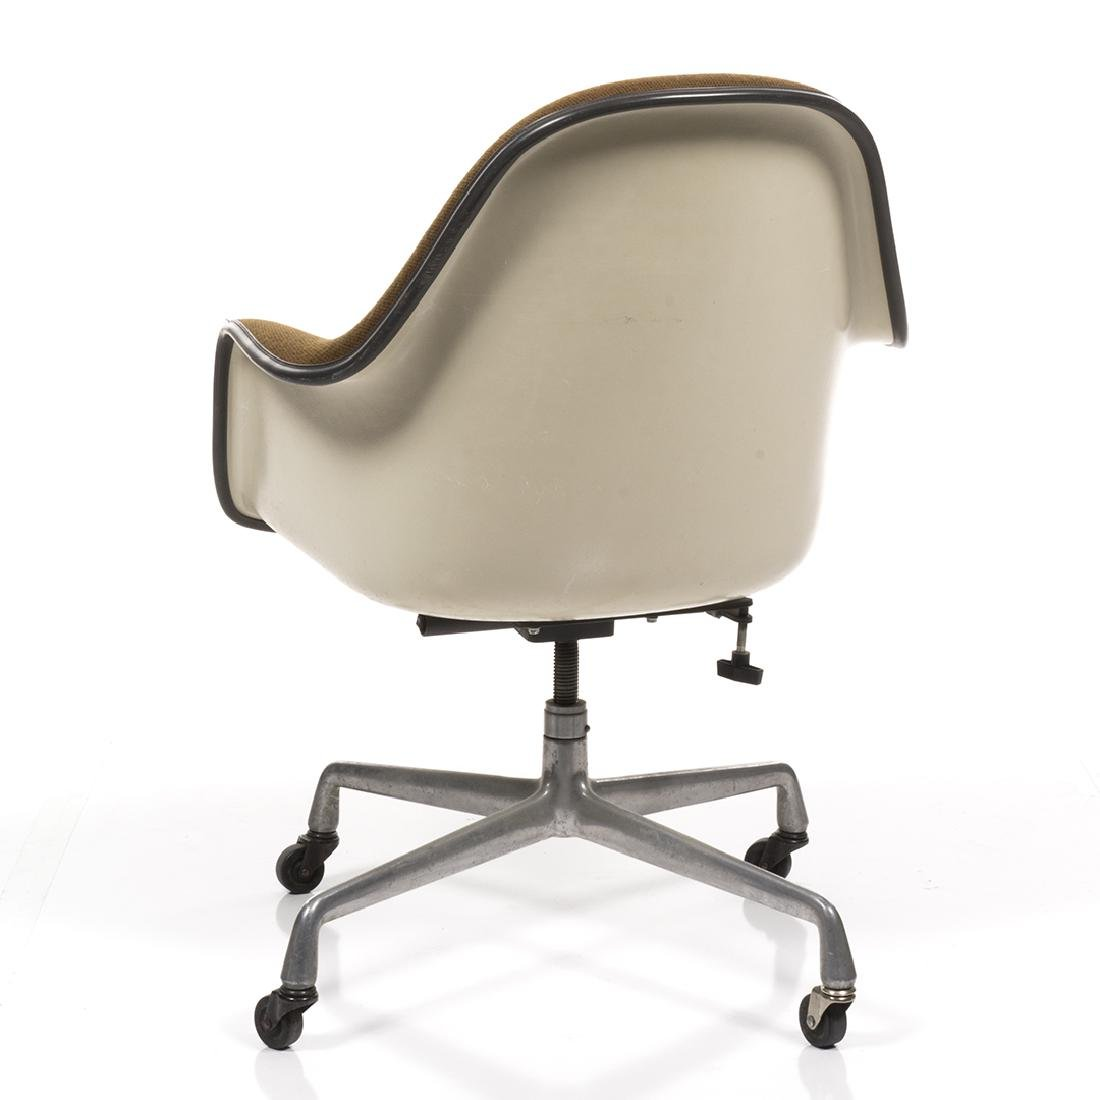 Charles Eames Executive Shell Chair - 5